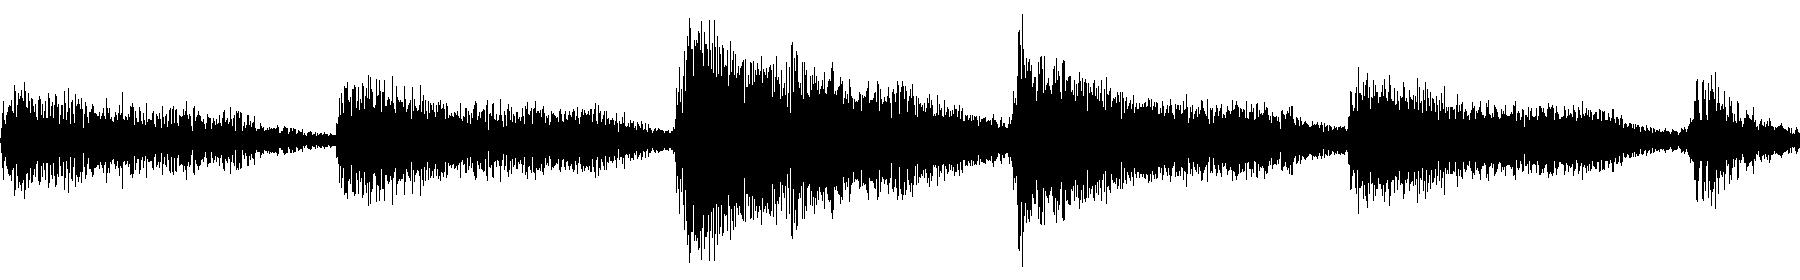 shs ch musicloop 125 epiano4 gm